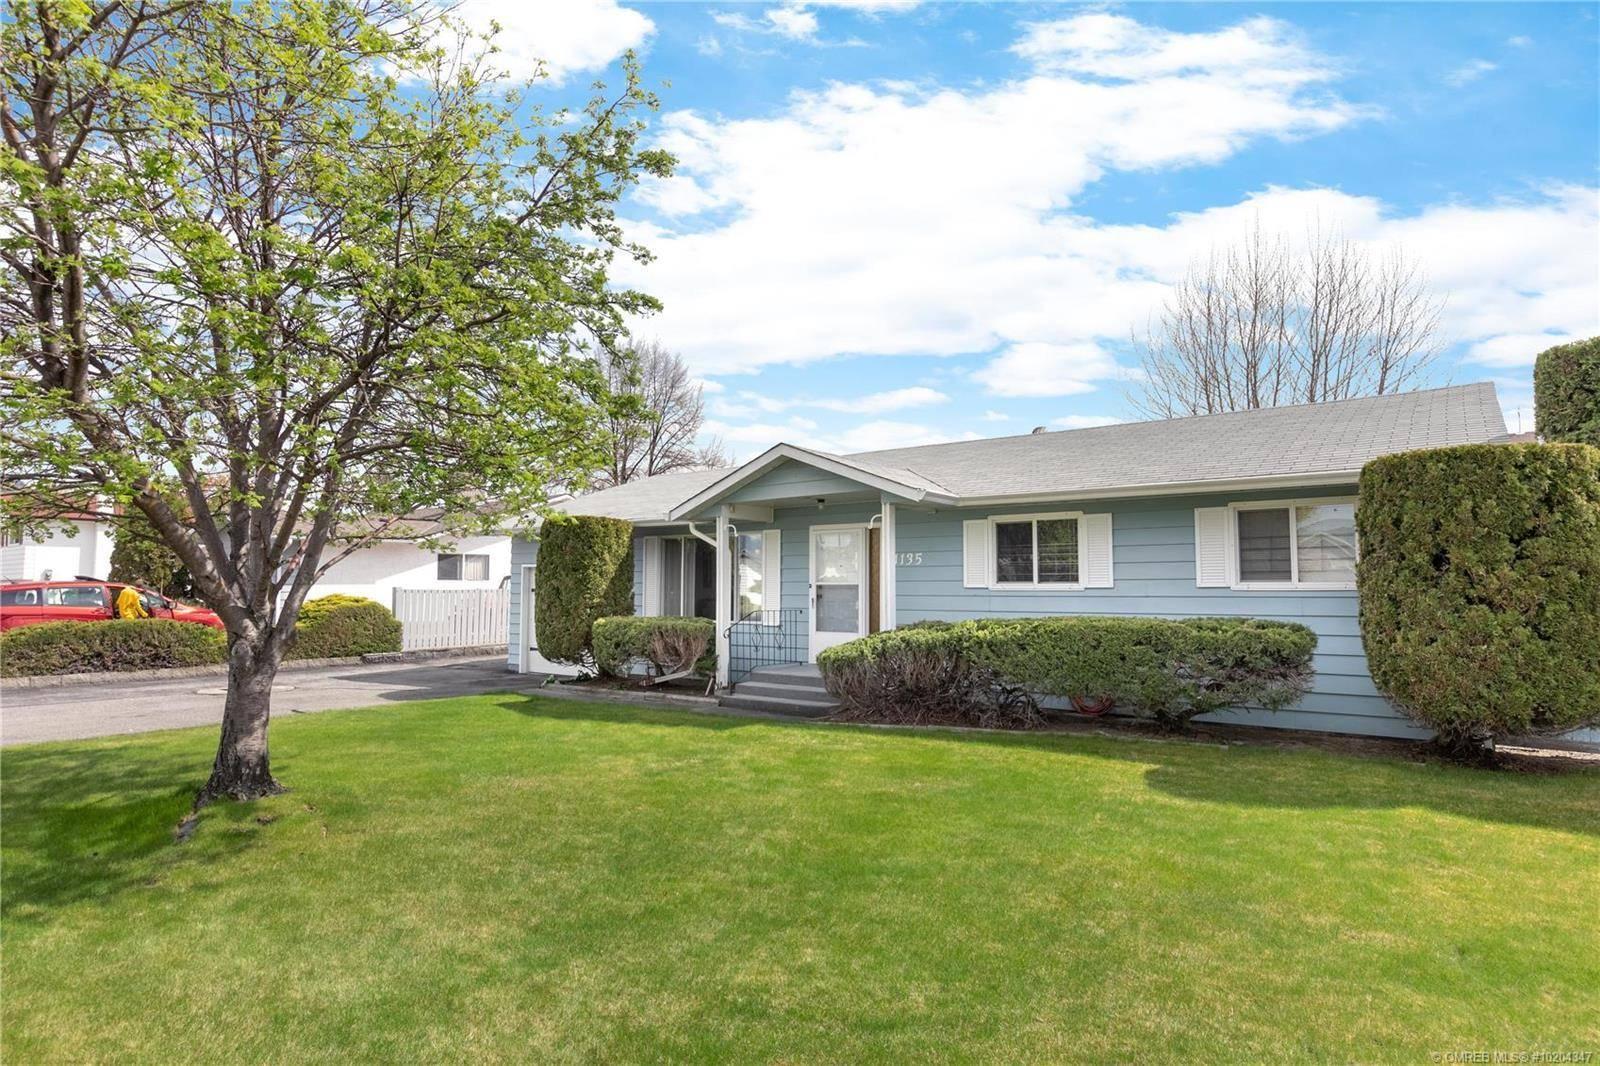 House for sale at 1135 Theodora Rd Kelowna British Columbia - MLS: 10204347